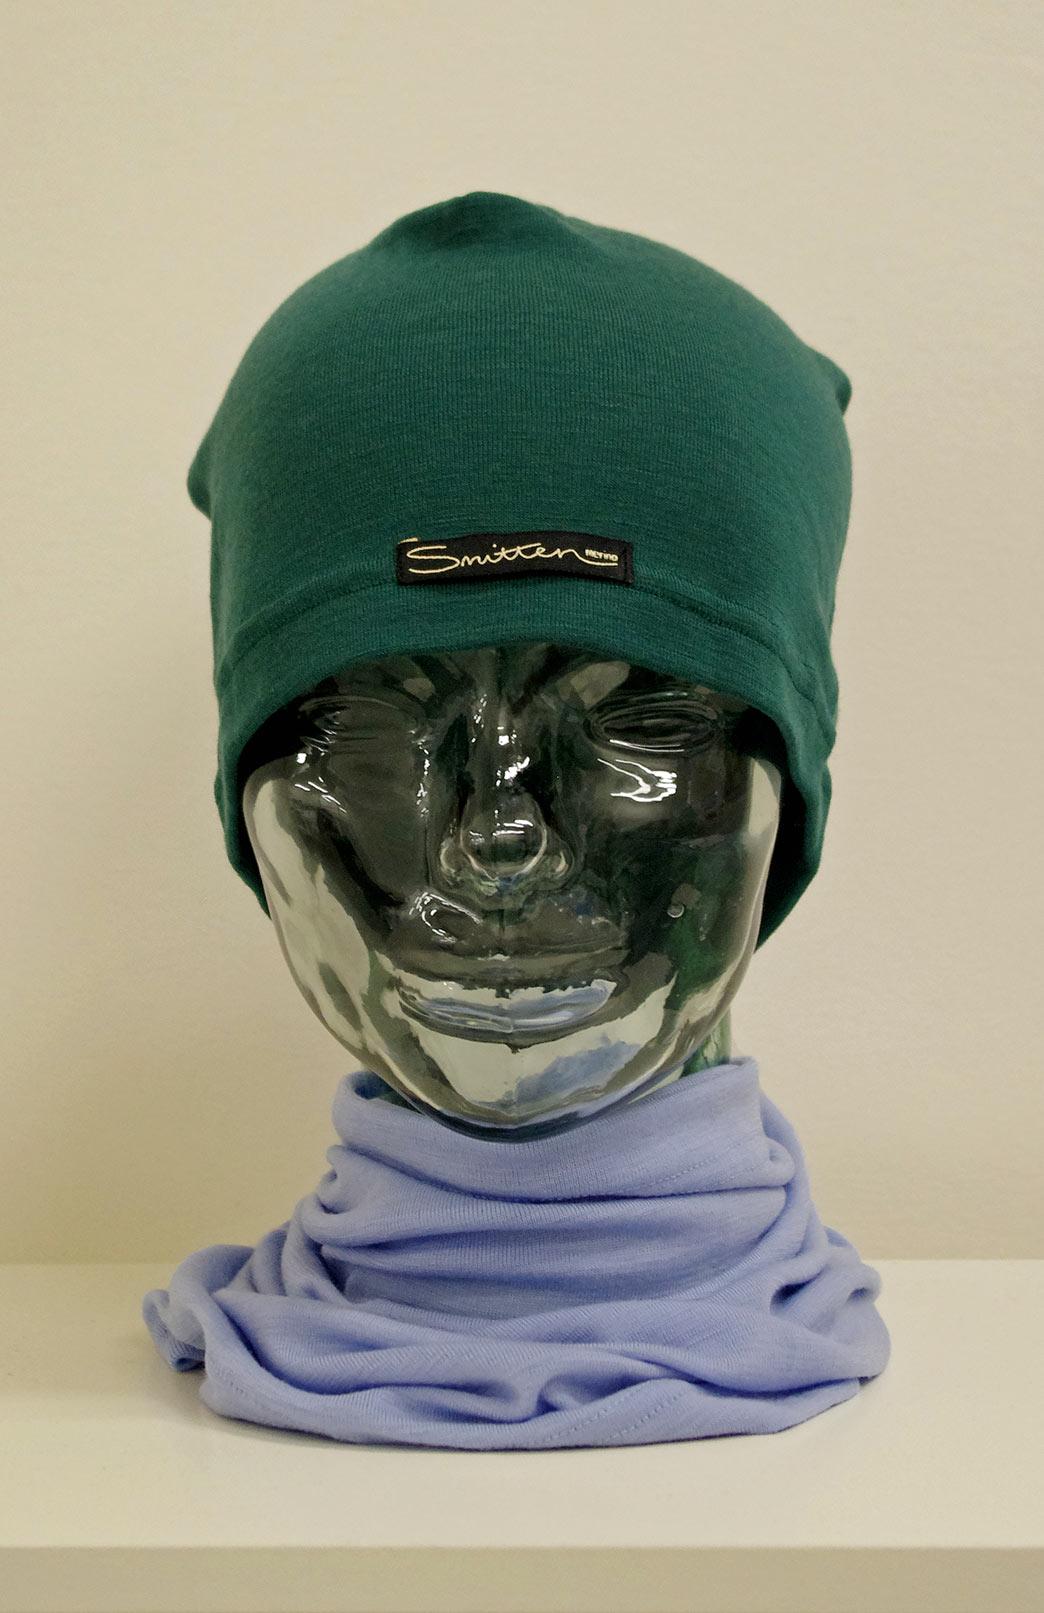 Beanie - Mid-weight Loose Fit Skull Cap - Unisex Emerald Green Merino Wool Loose Fit Beanie Skull Cap - Smitten Merino Tasmania Australia